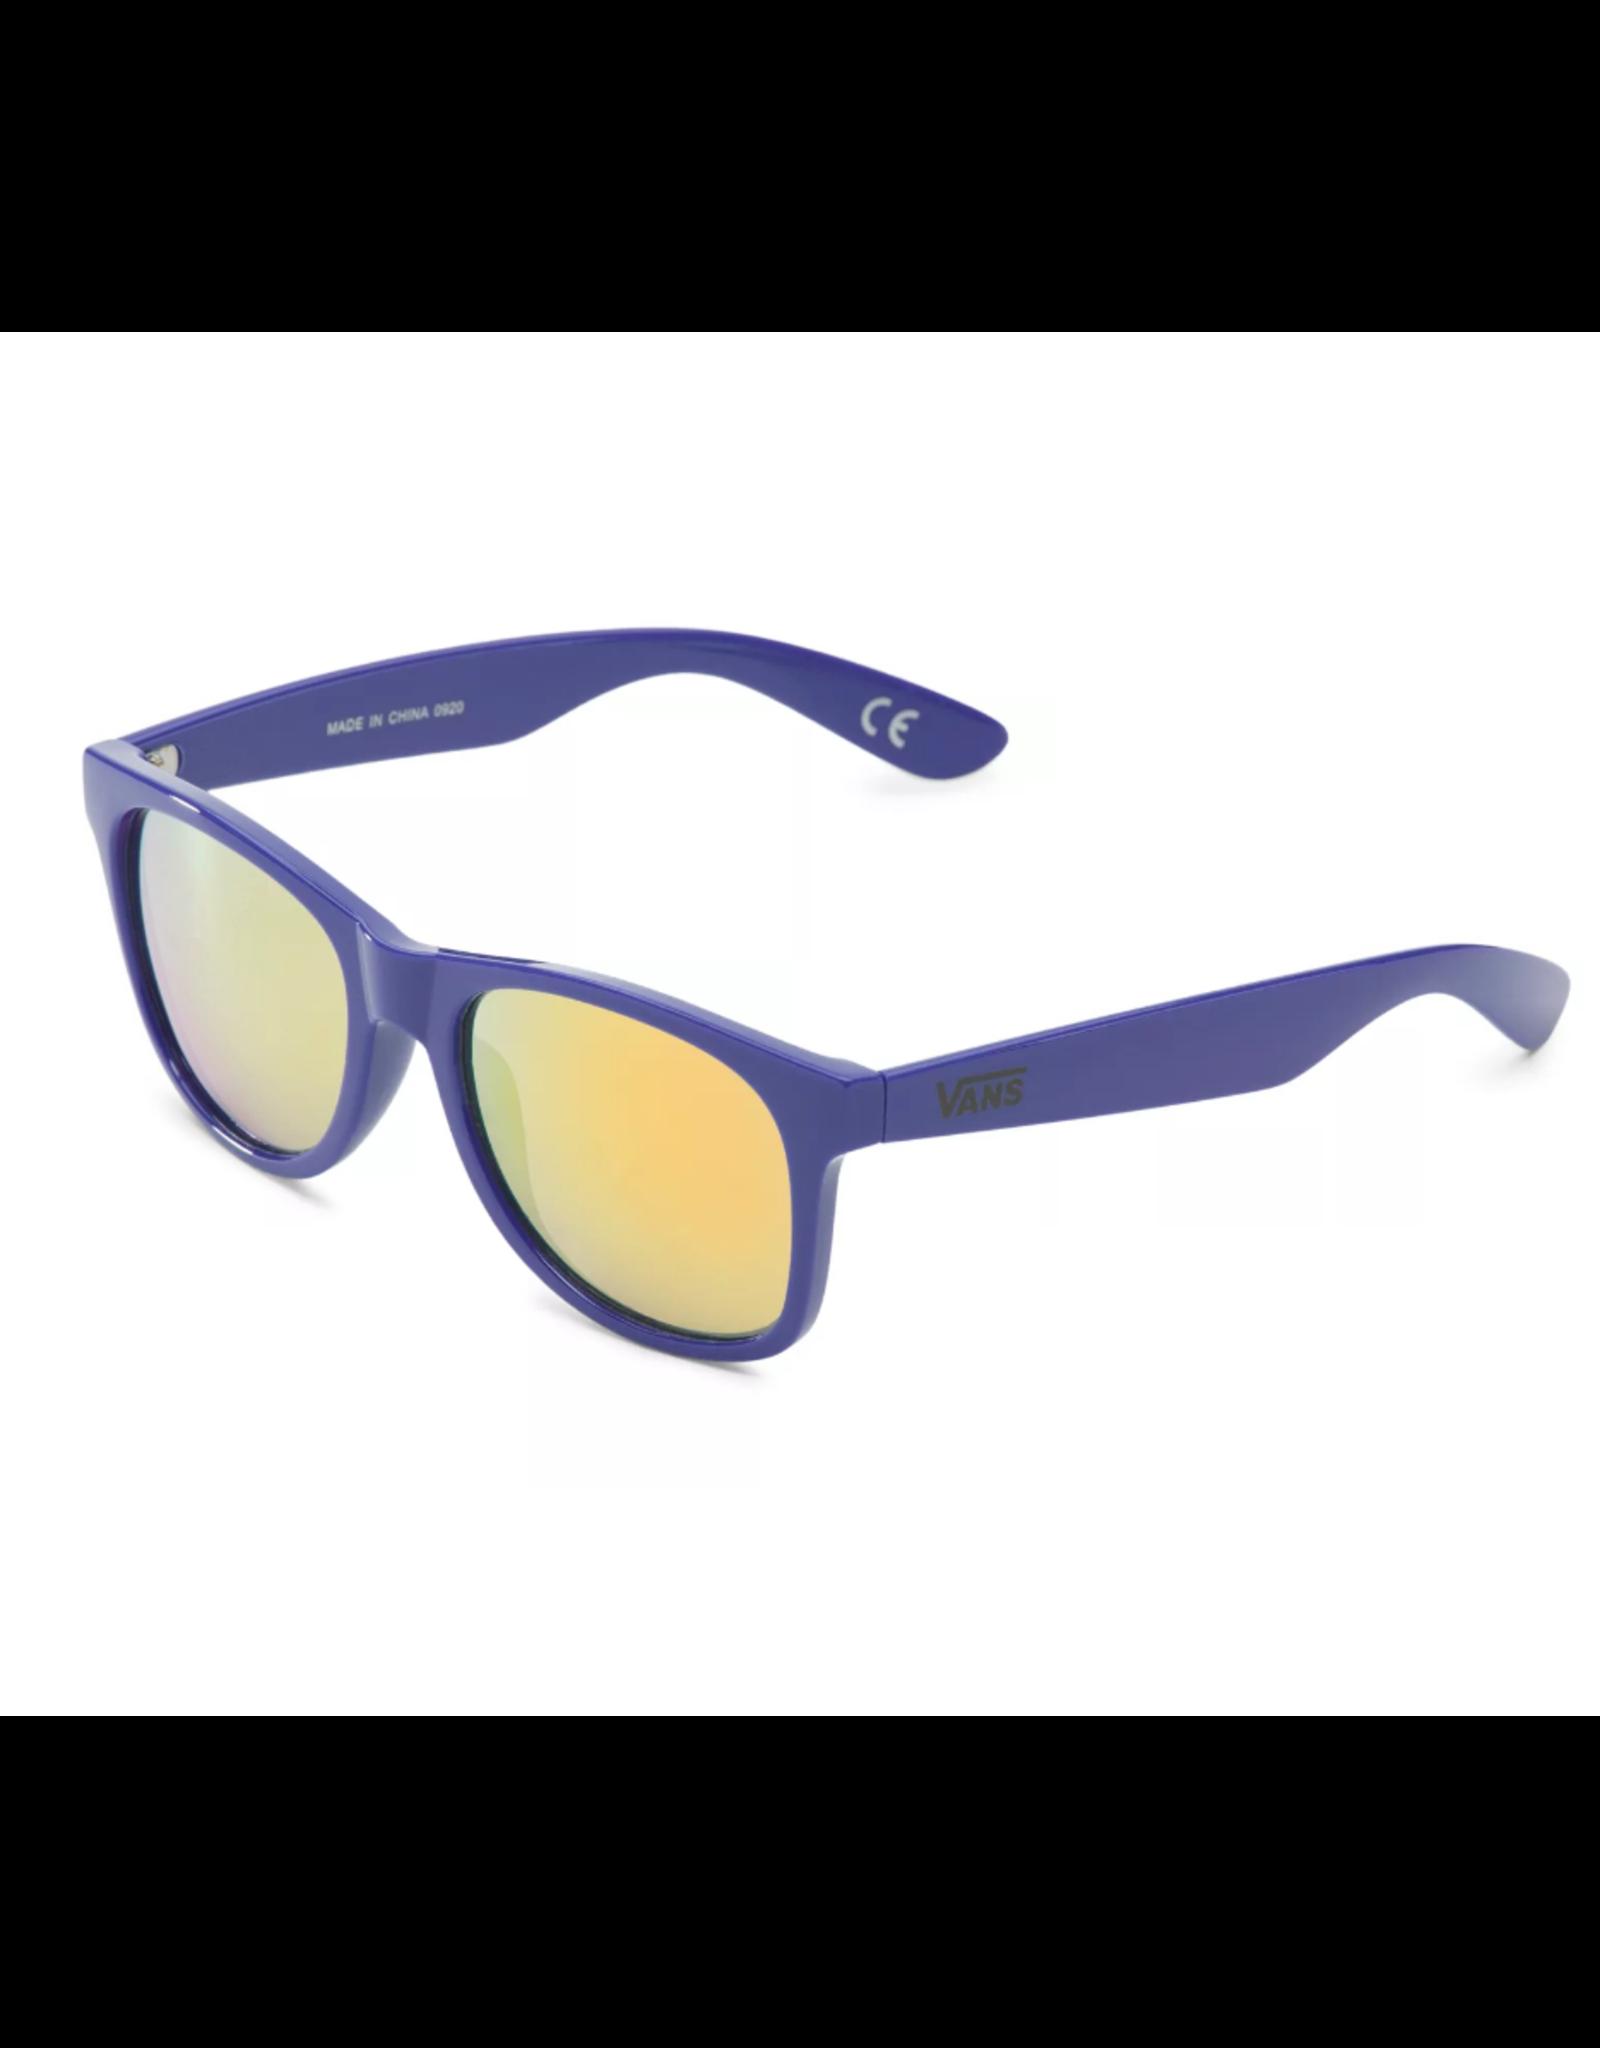 Vans Spicoli 4 Shades - Spectrum Blue